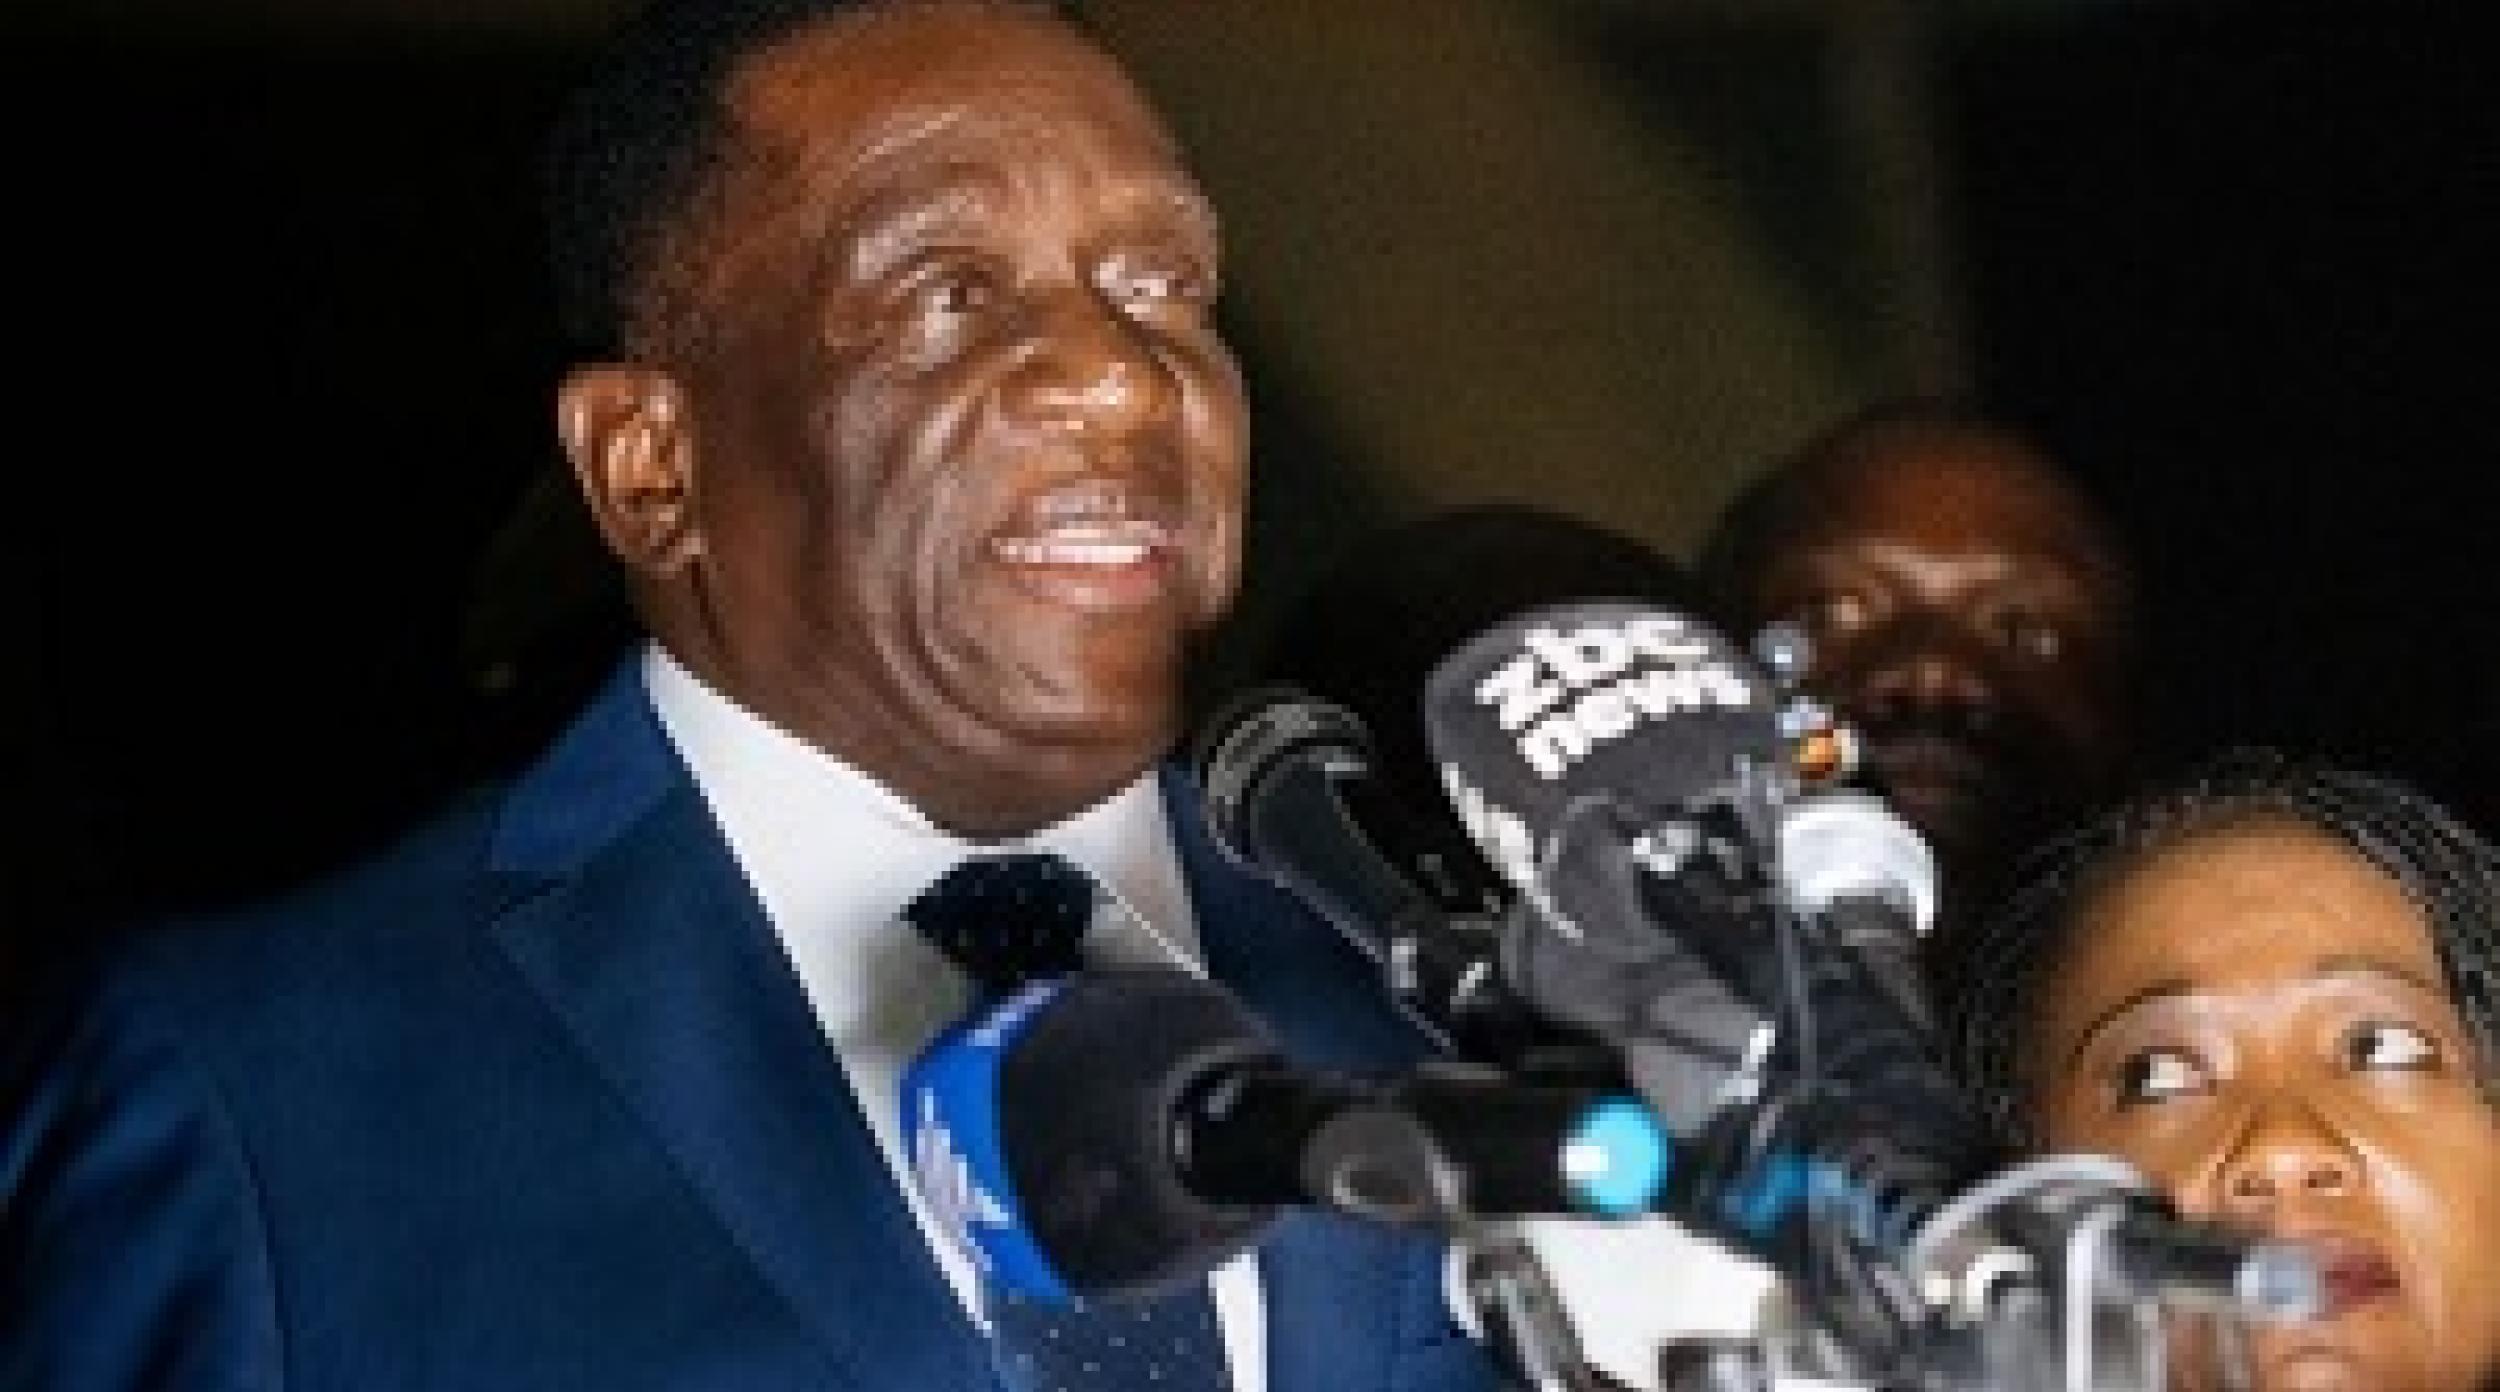 NEWS: አዲሱ የዚምባብዌ መሪ ዴሞከራሲን ለማስፈን ሥራ ለመፍጠር ቃል ገቡ - Zimbabwe's Mnangagwa Promises Jobs in 'New Democracy'